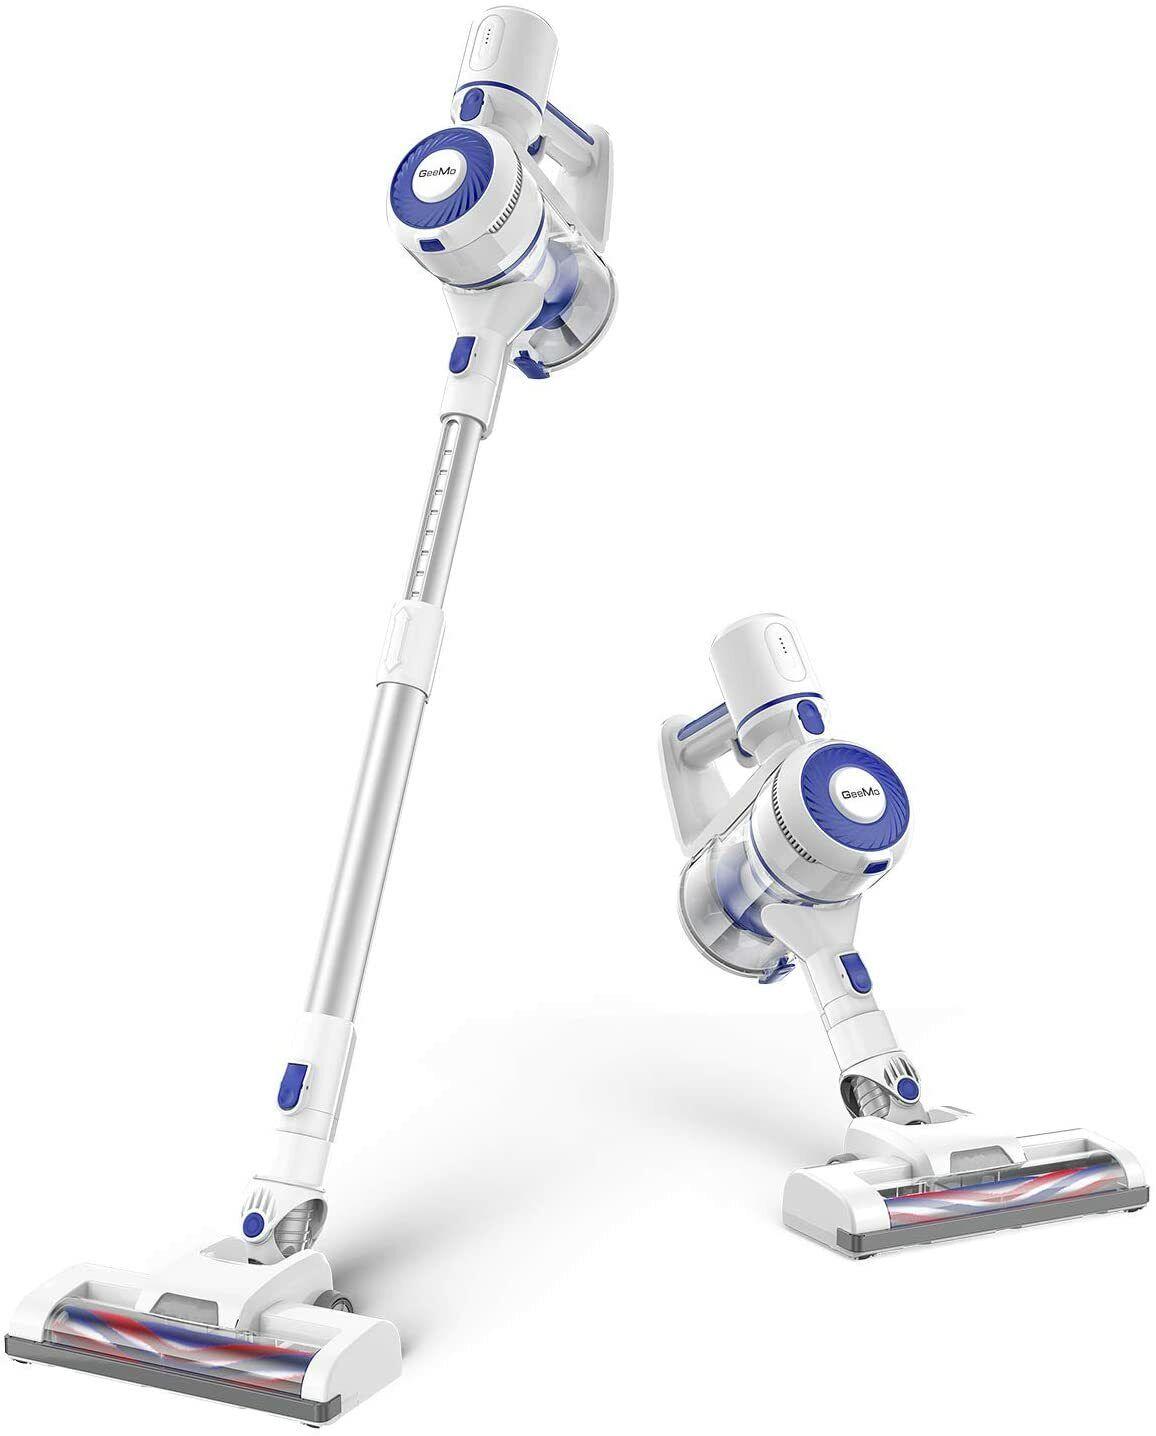 GeeMo Cordless 4 in 1 Stick Vacuum Cleaner 150w Suction Anti-Static 4 Pet Carpet